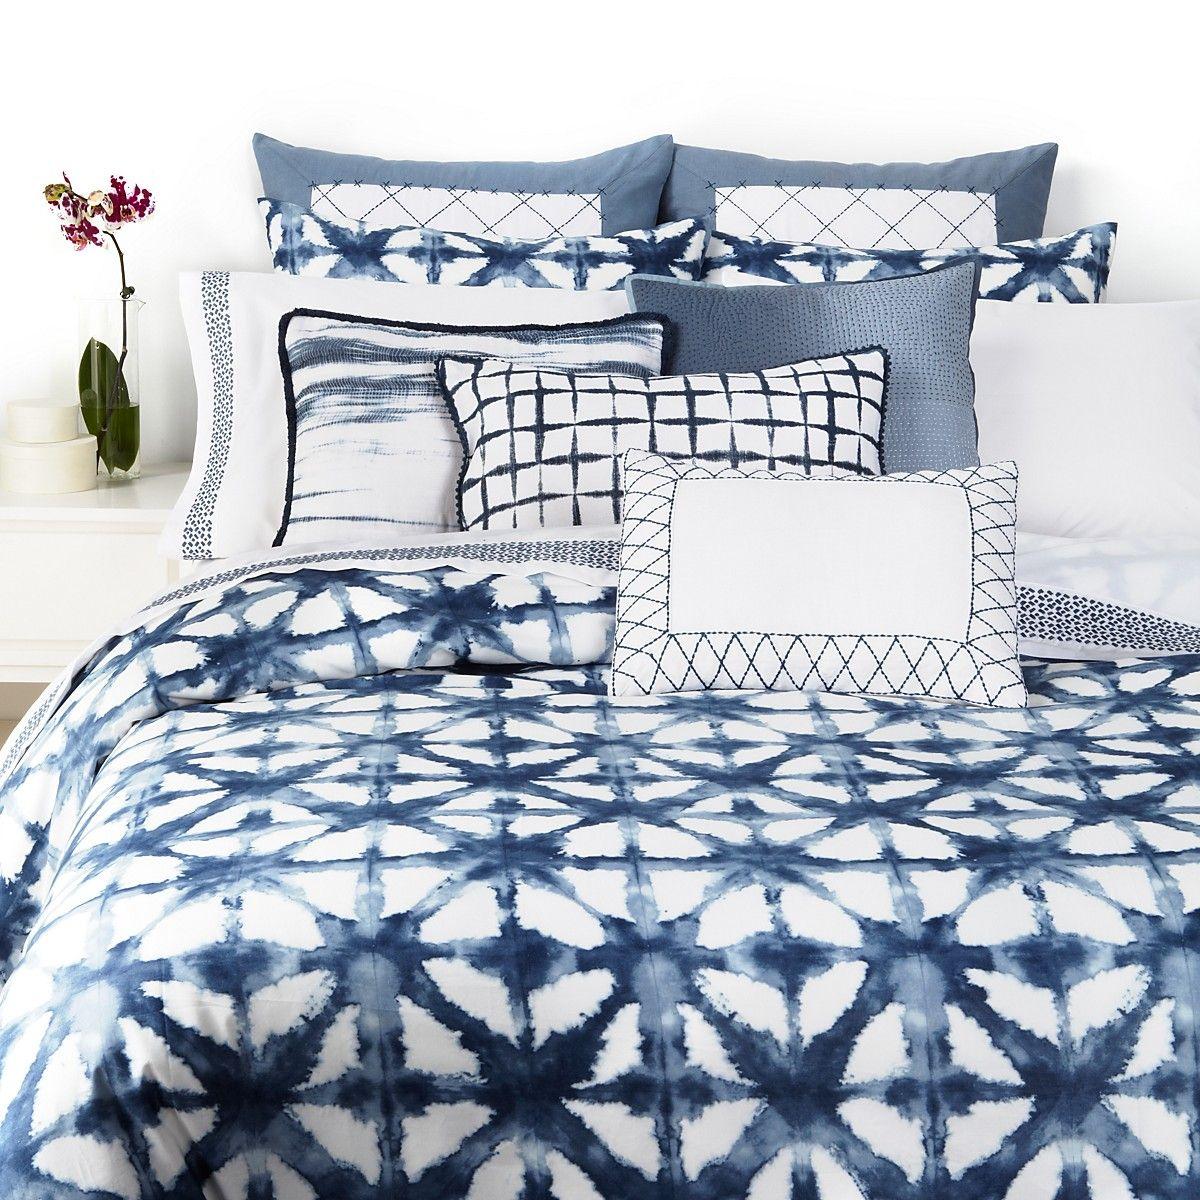 shibori bedding by Vera Wang